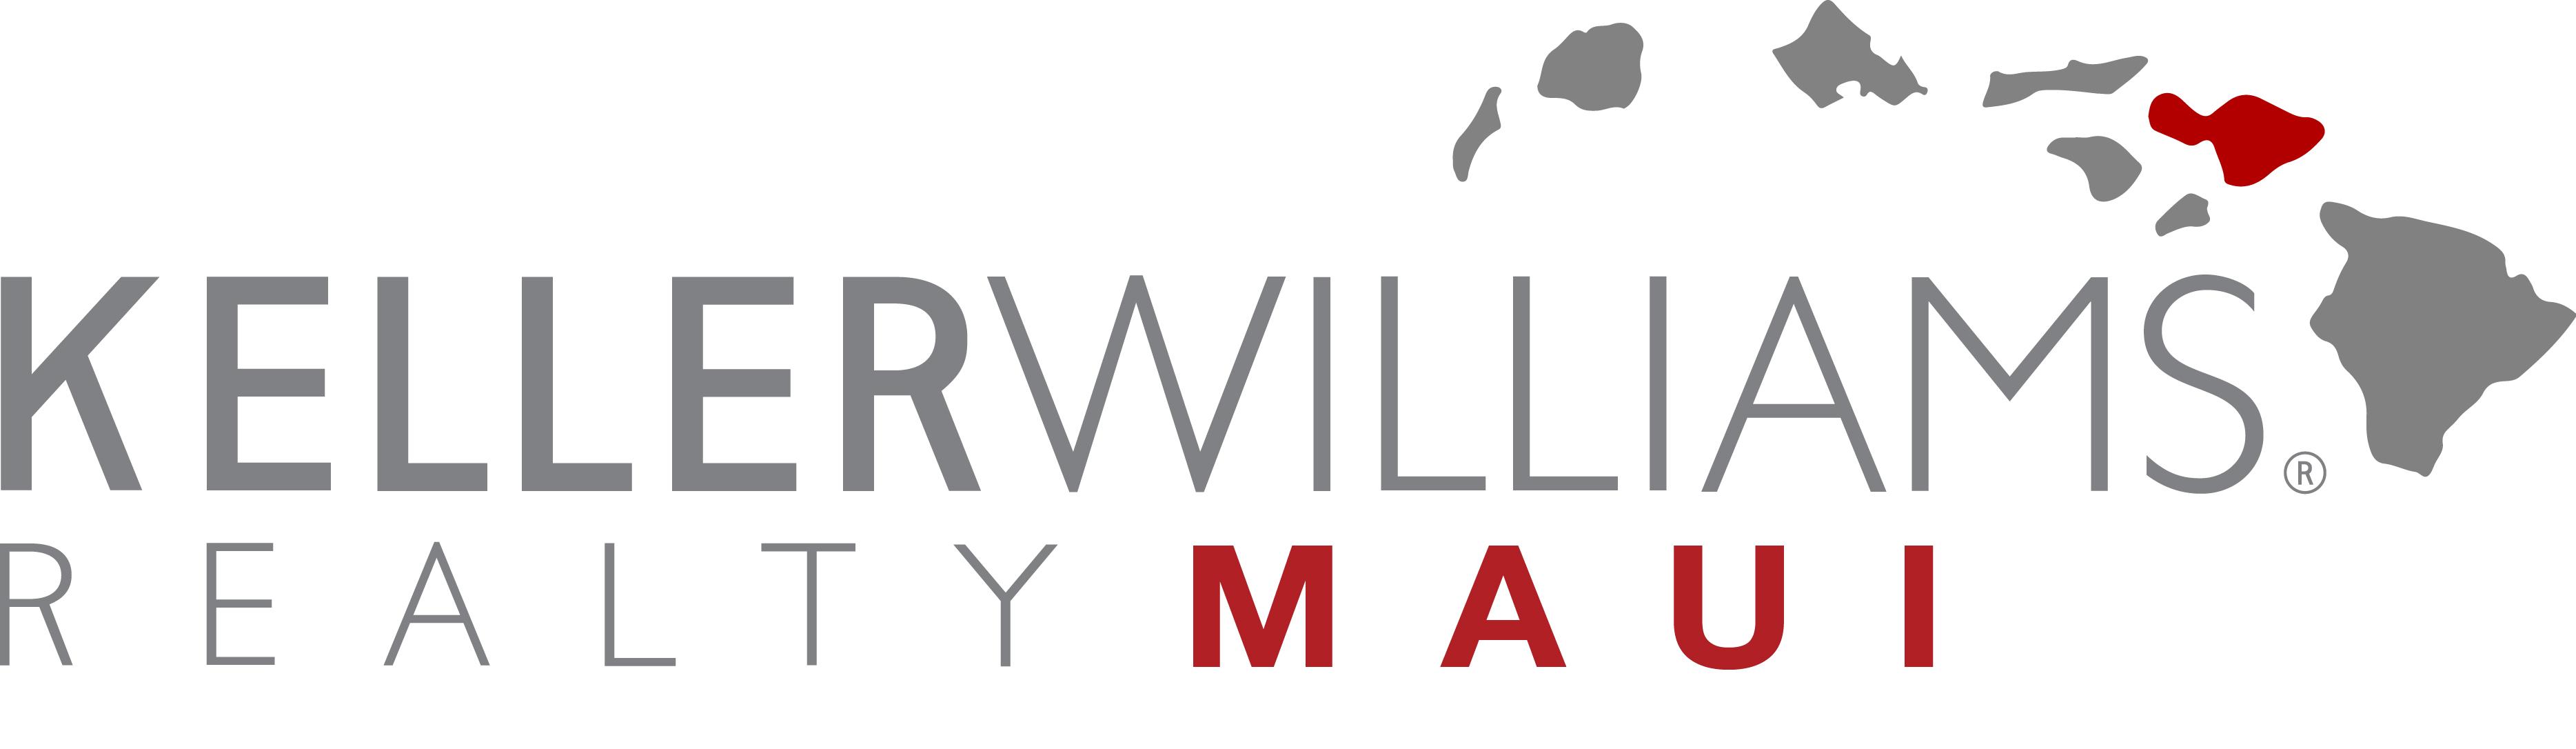 Keller Williams Realty Maui logo